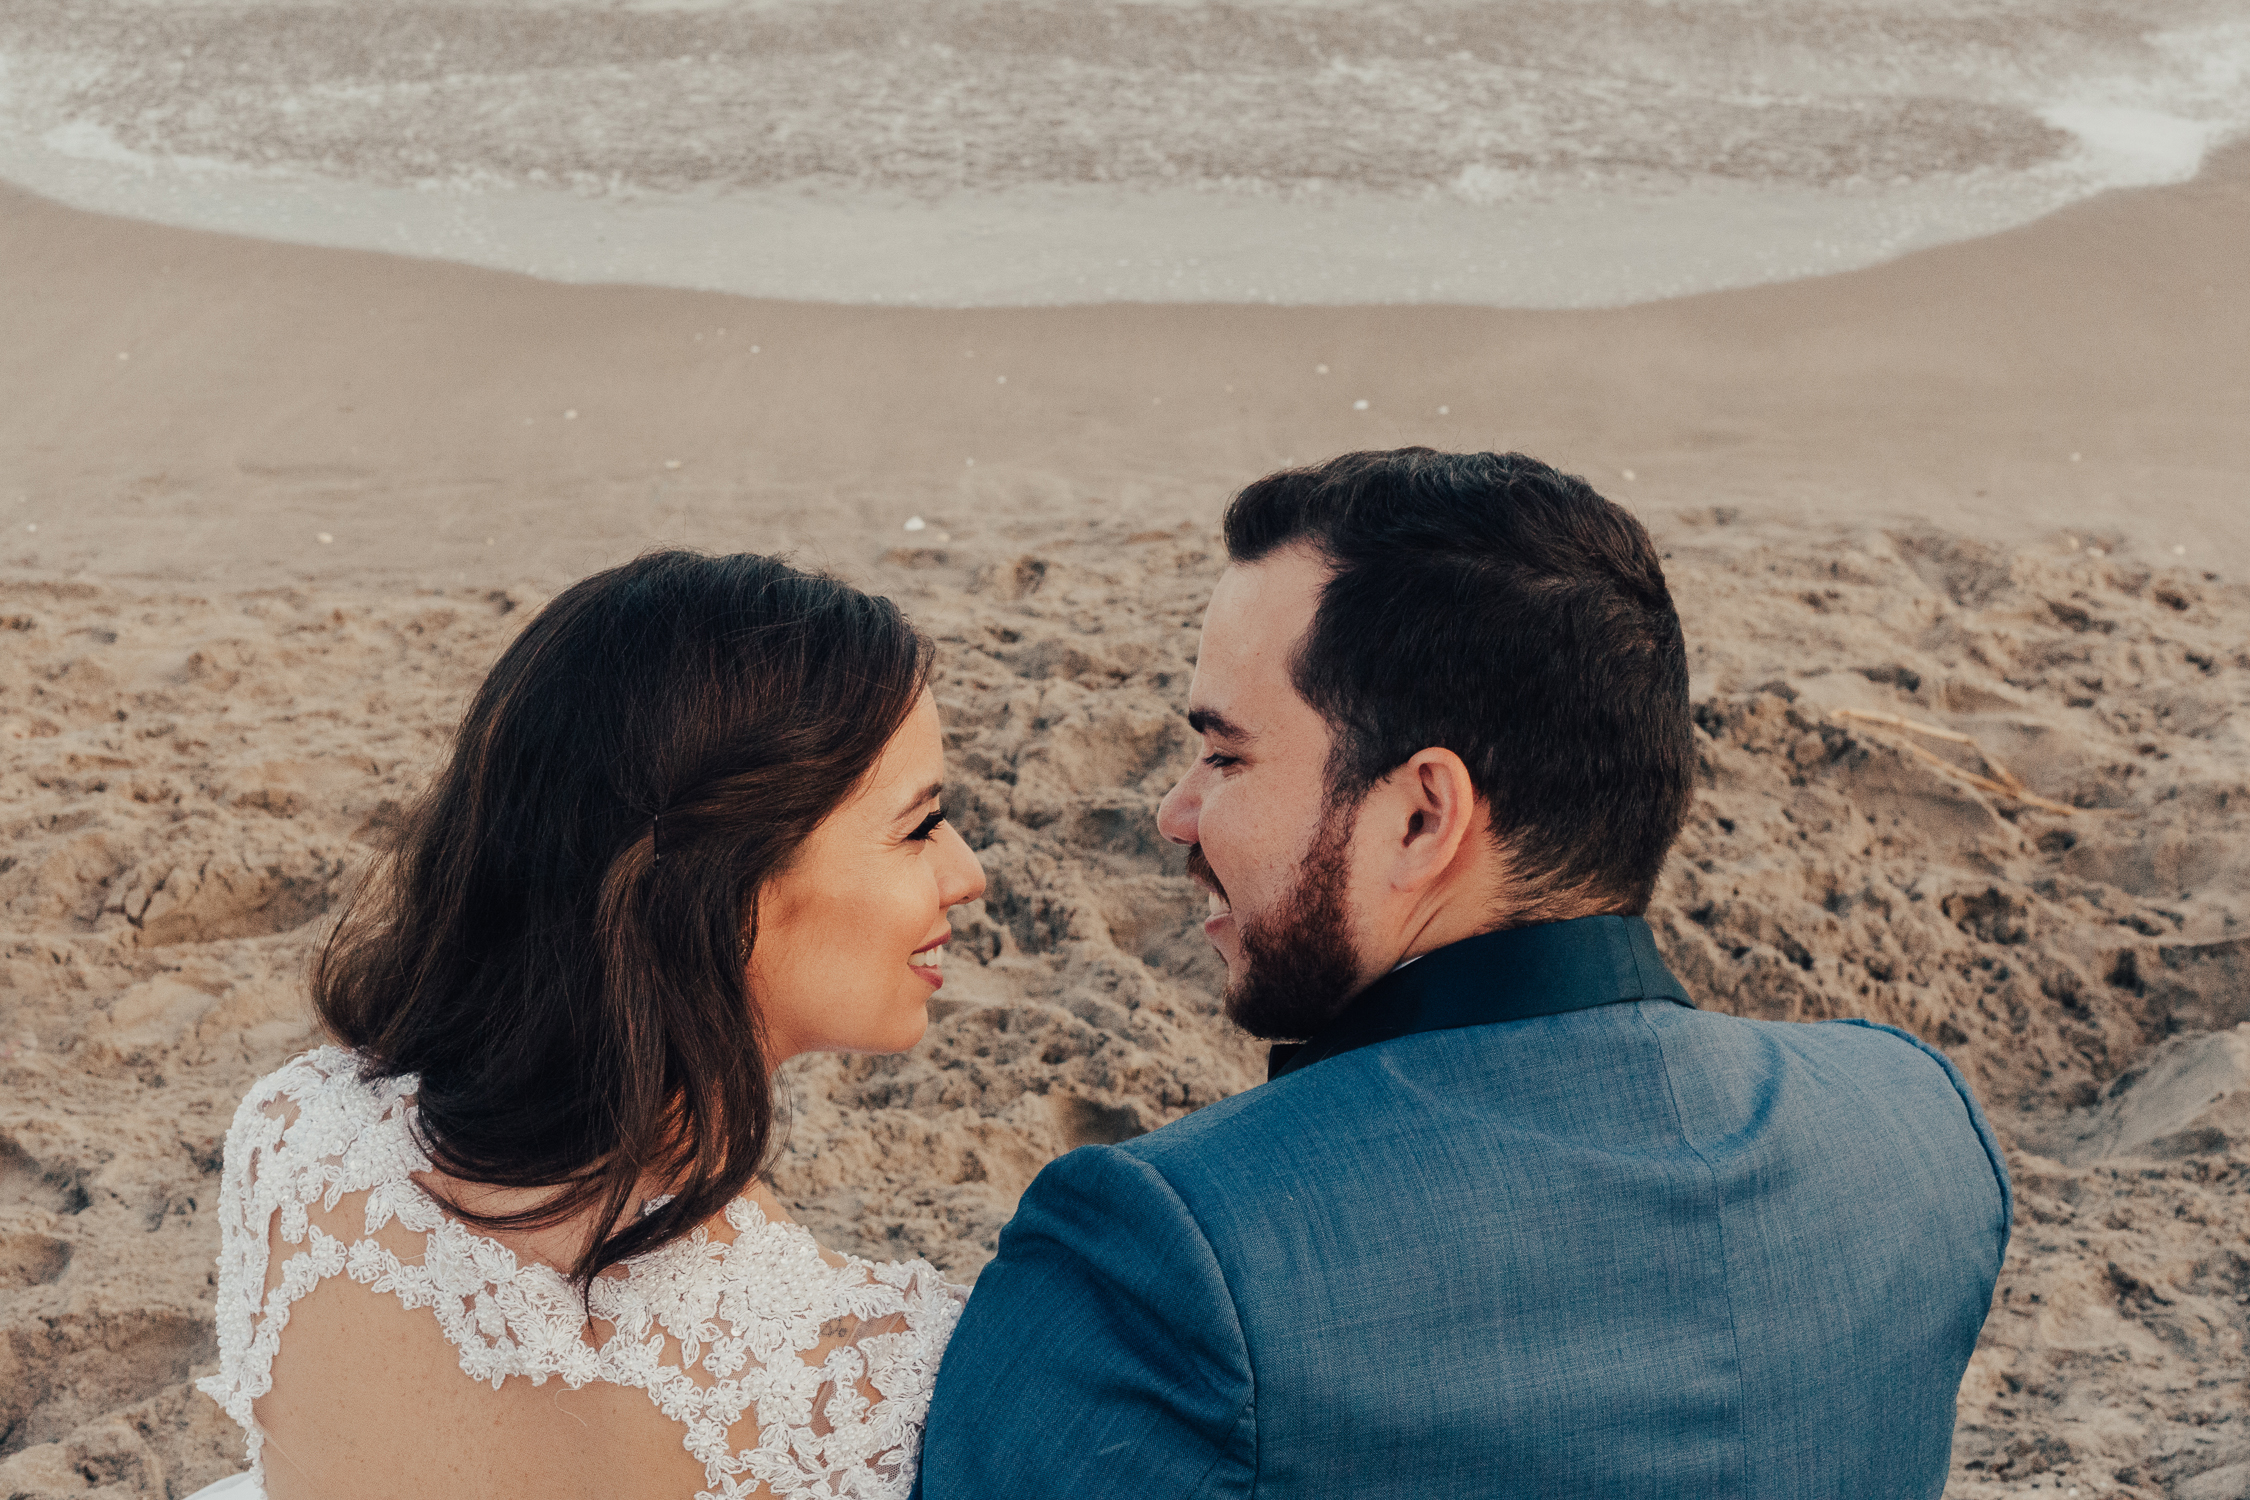 Michelle-Agurto-Fotografia-Bodas-Ecuador-Destination-Wedding-Photographer-Gabriela-Gabriel-11.JPG